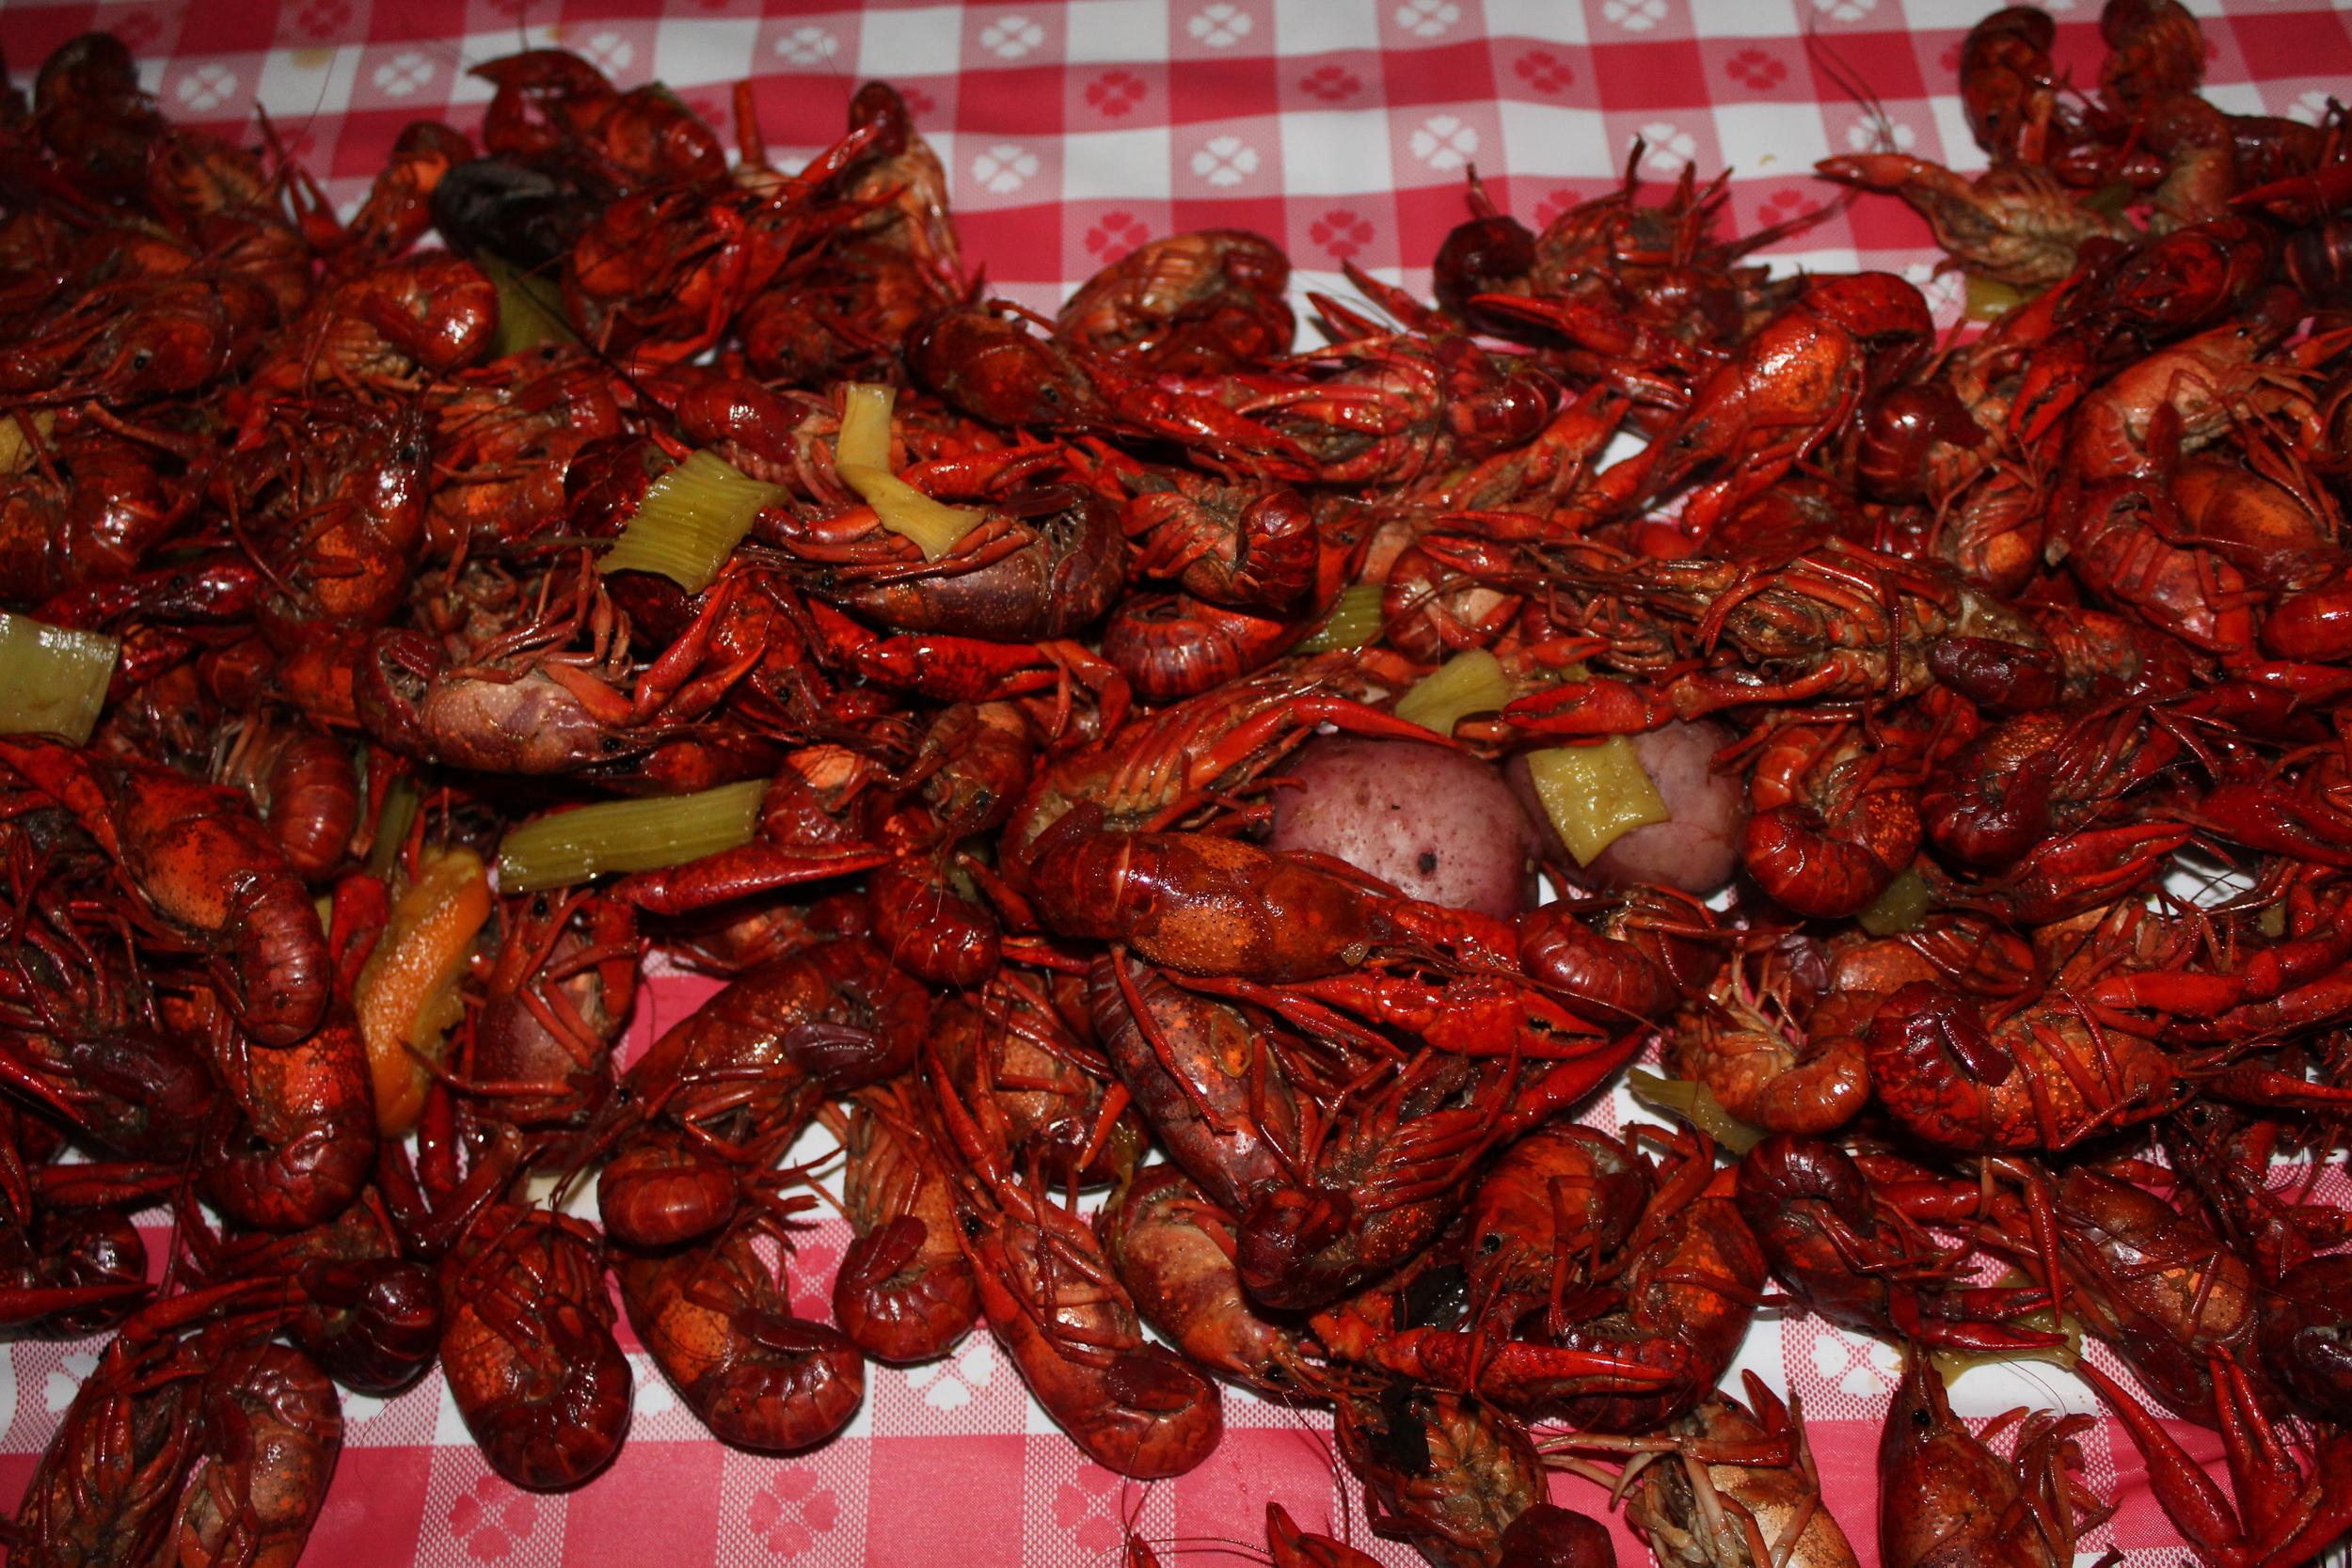 135 lbs of fresh Louisiana crawfish – boiled on-site!